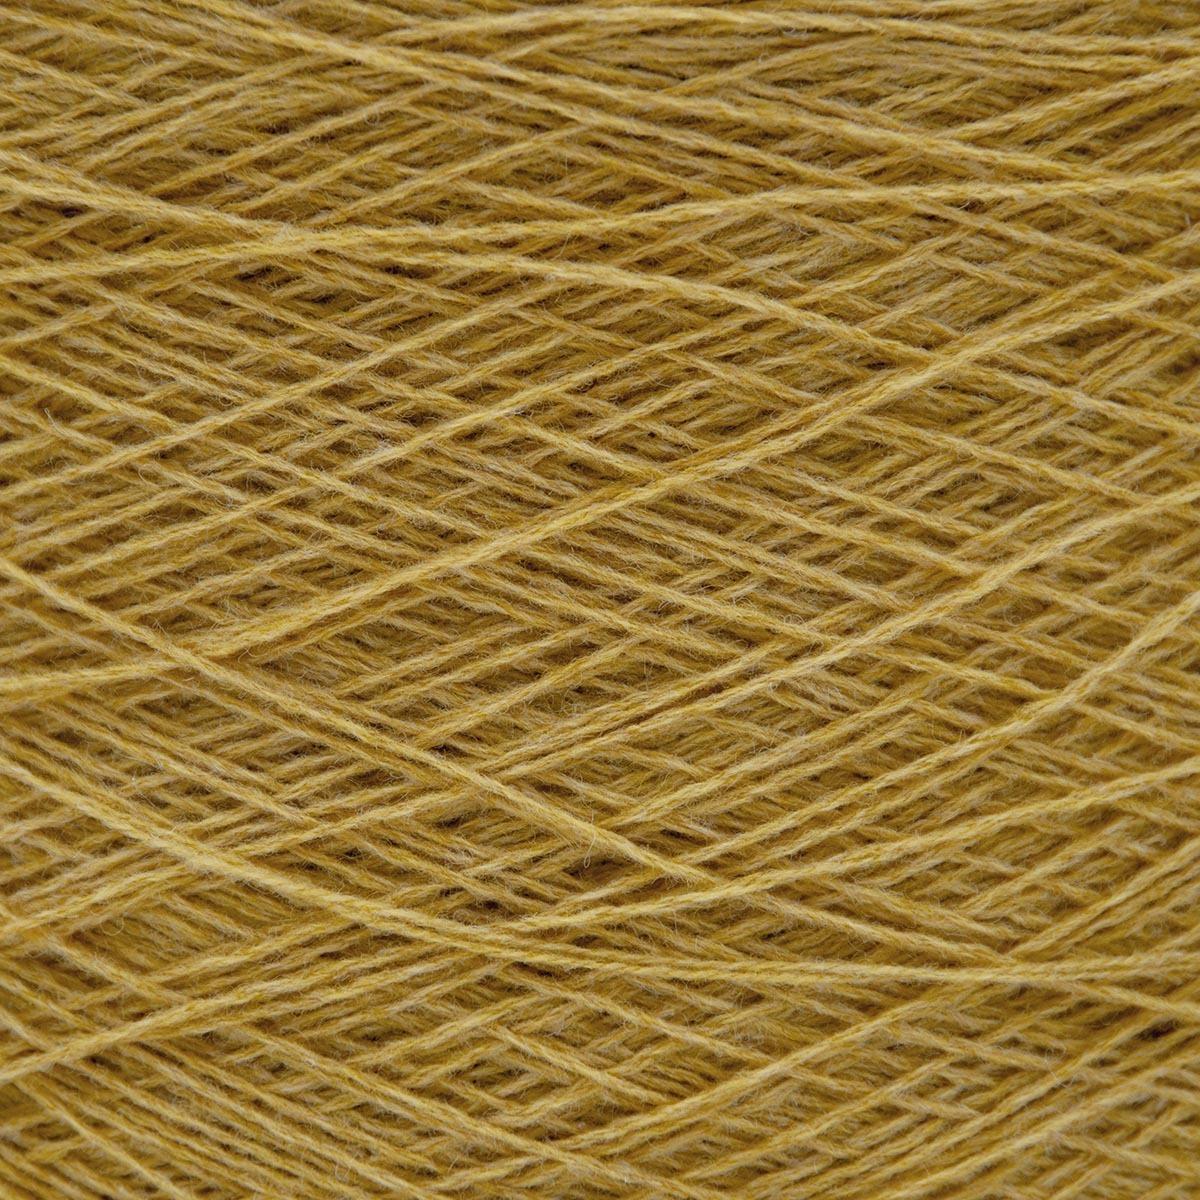 Knoll Yarns Merino Lambswool - 385